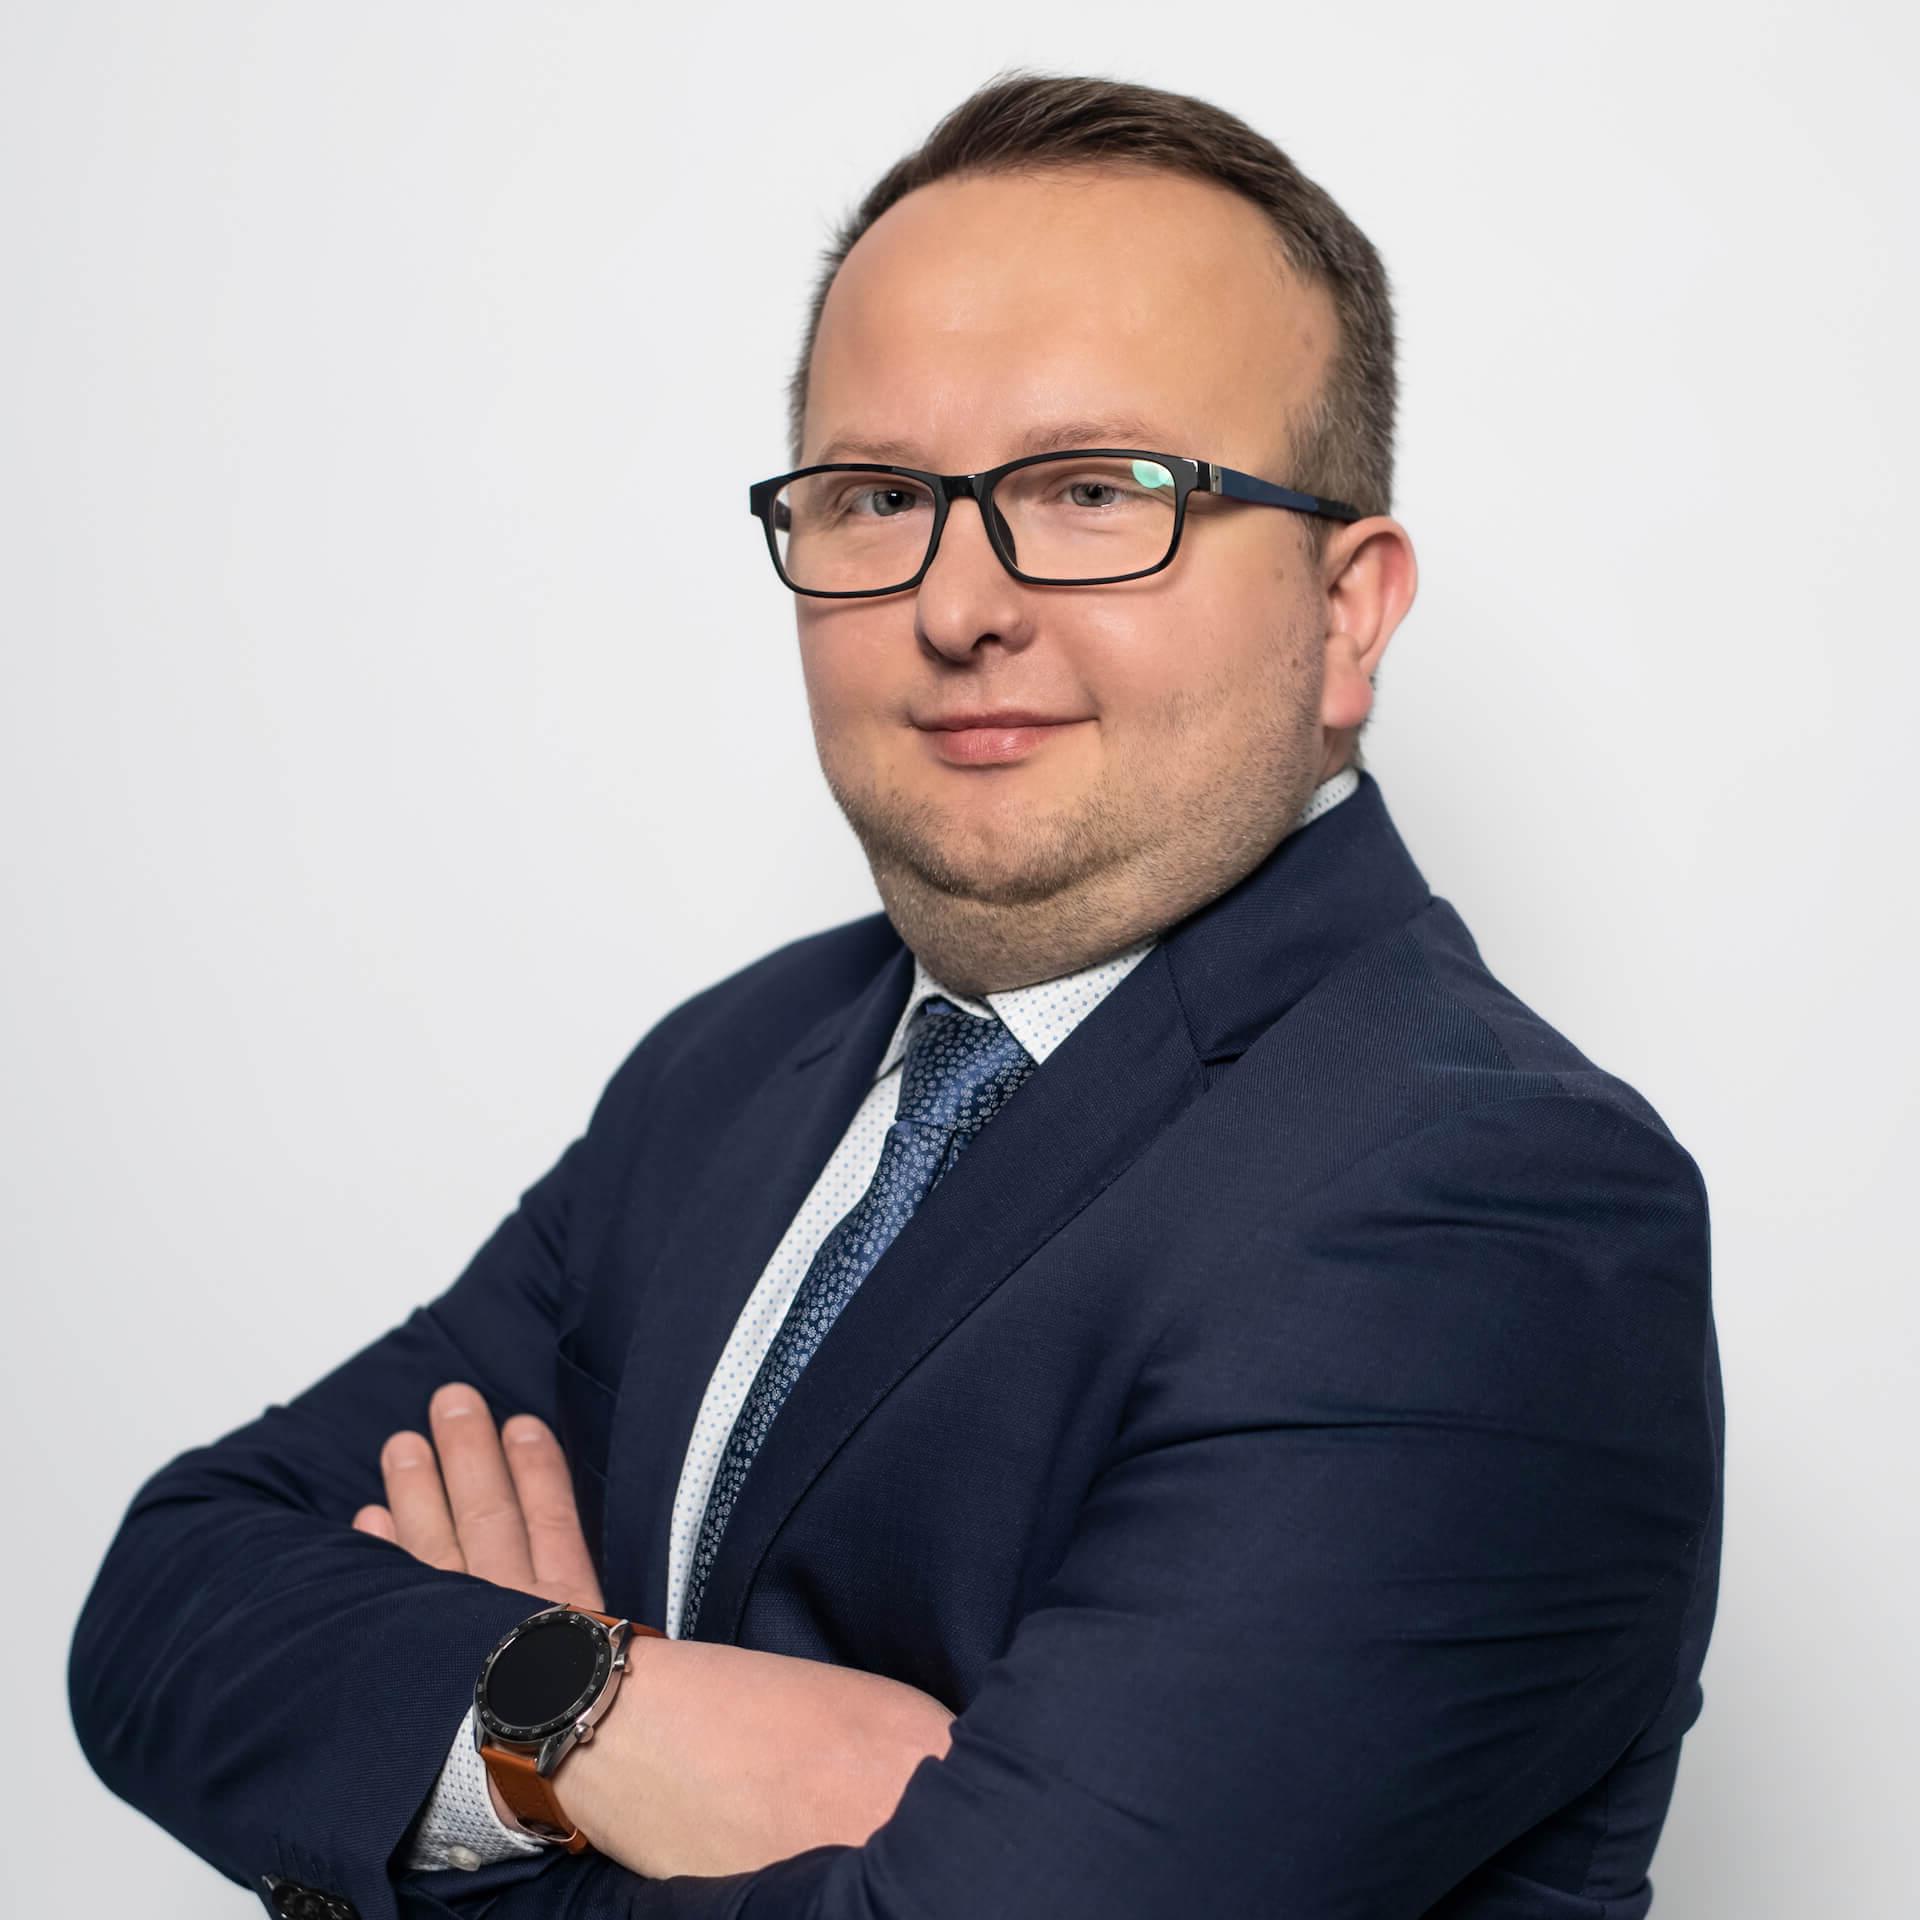 Marcin Lejk